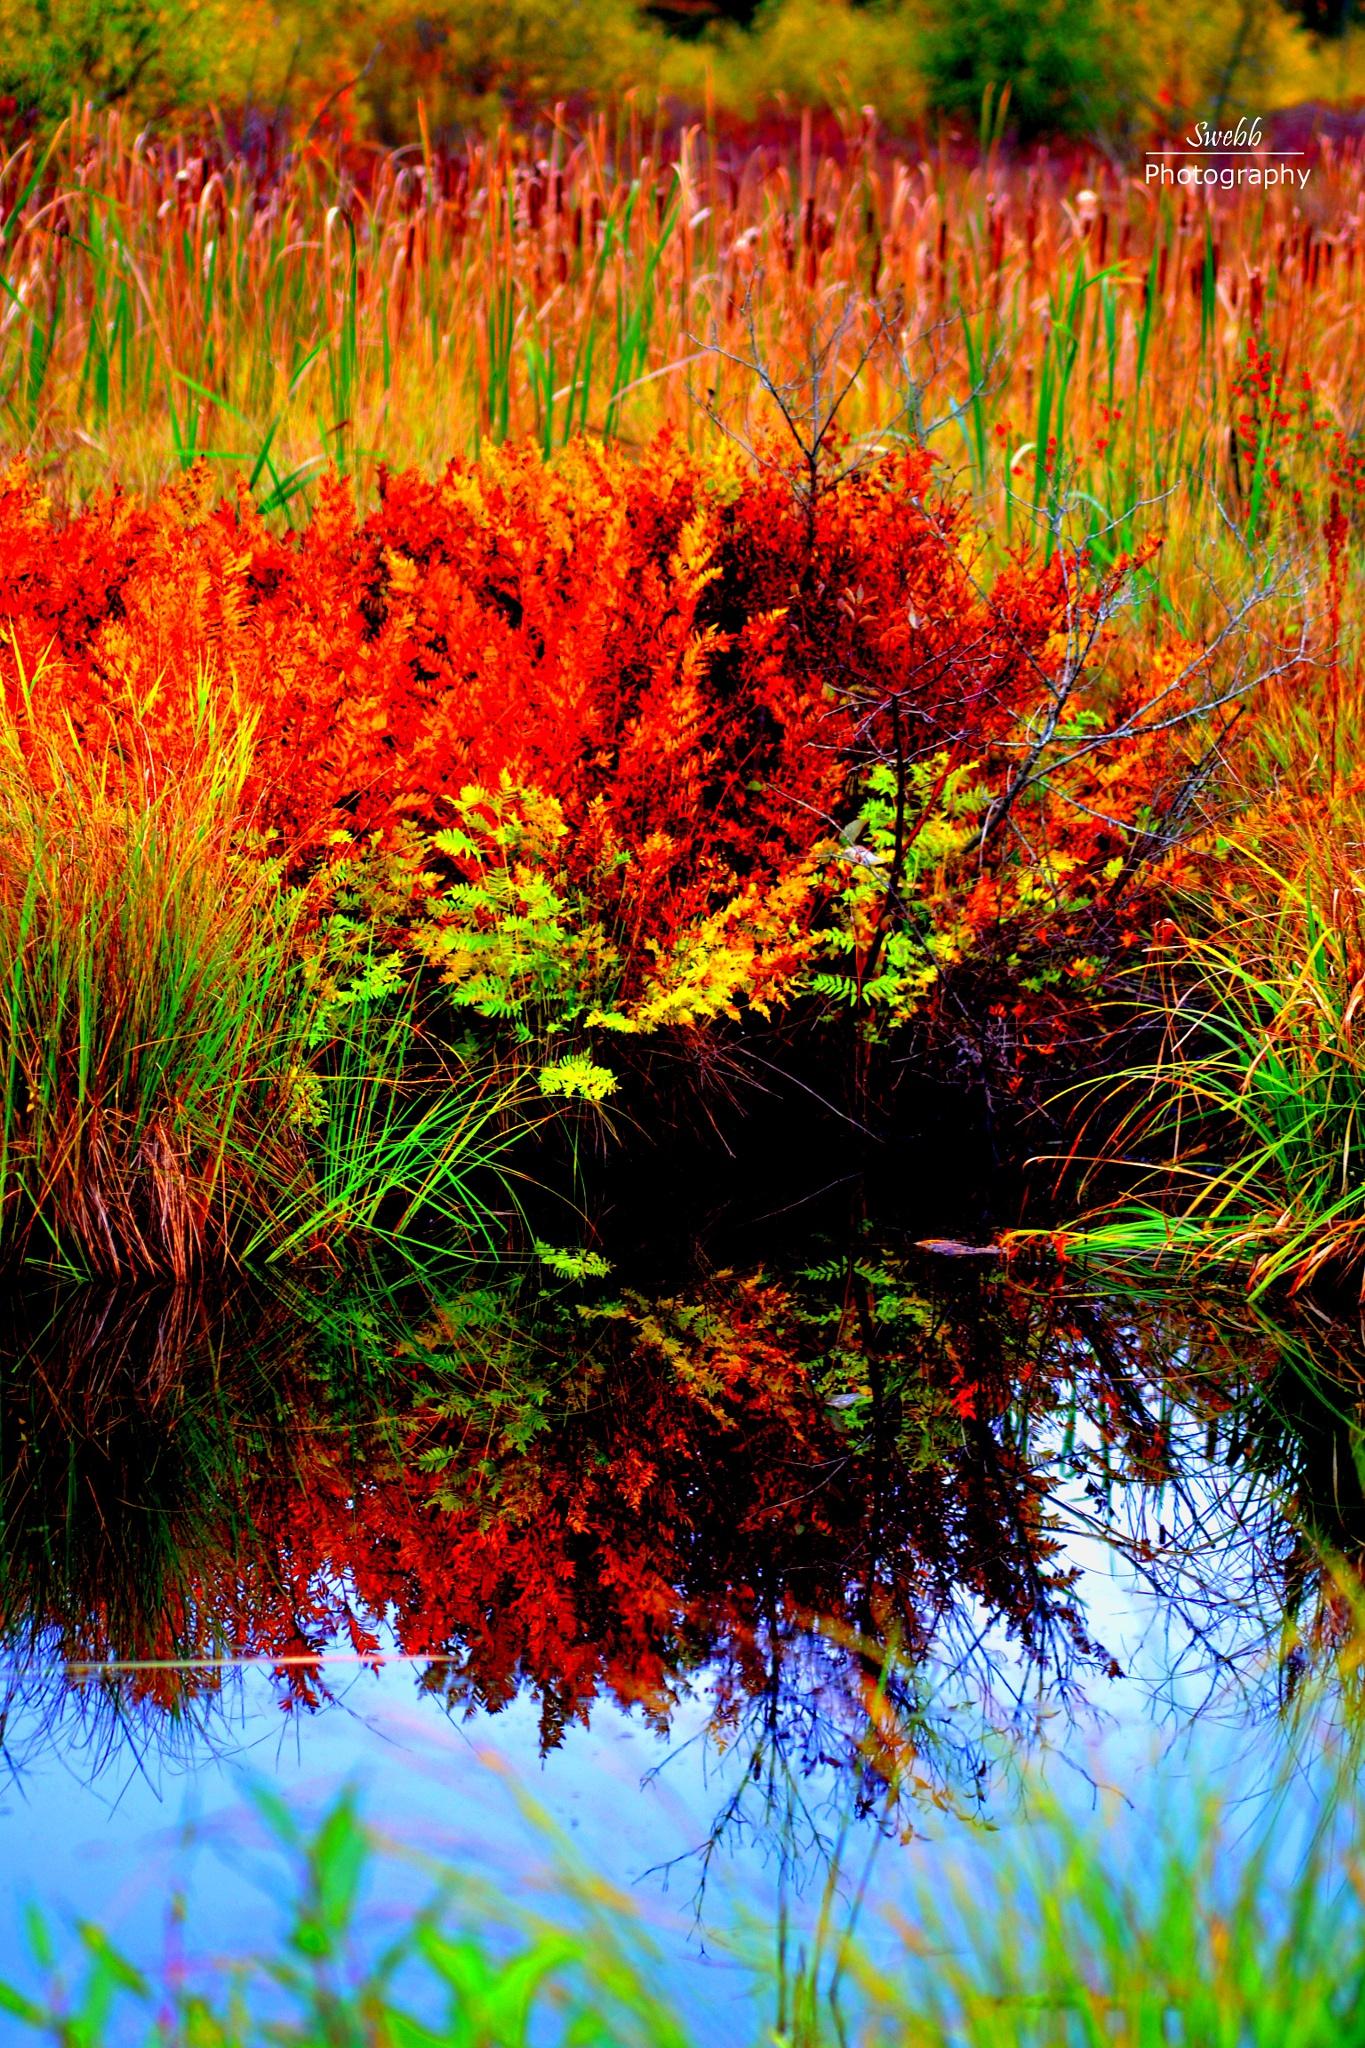 Autumn Reflection by Steve Webb